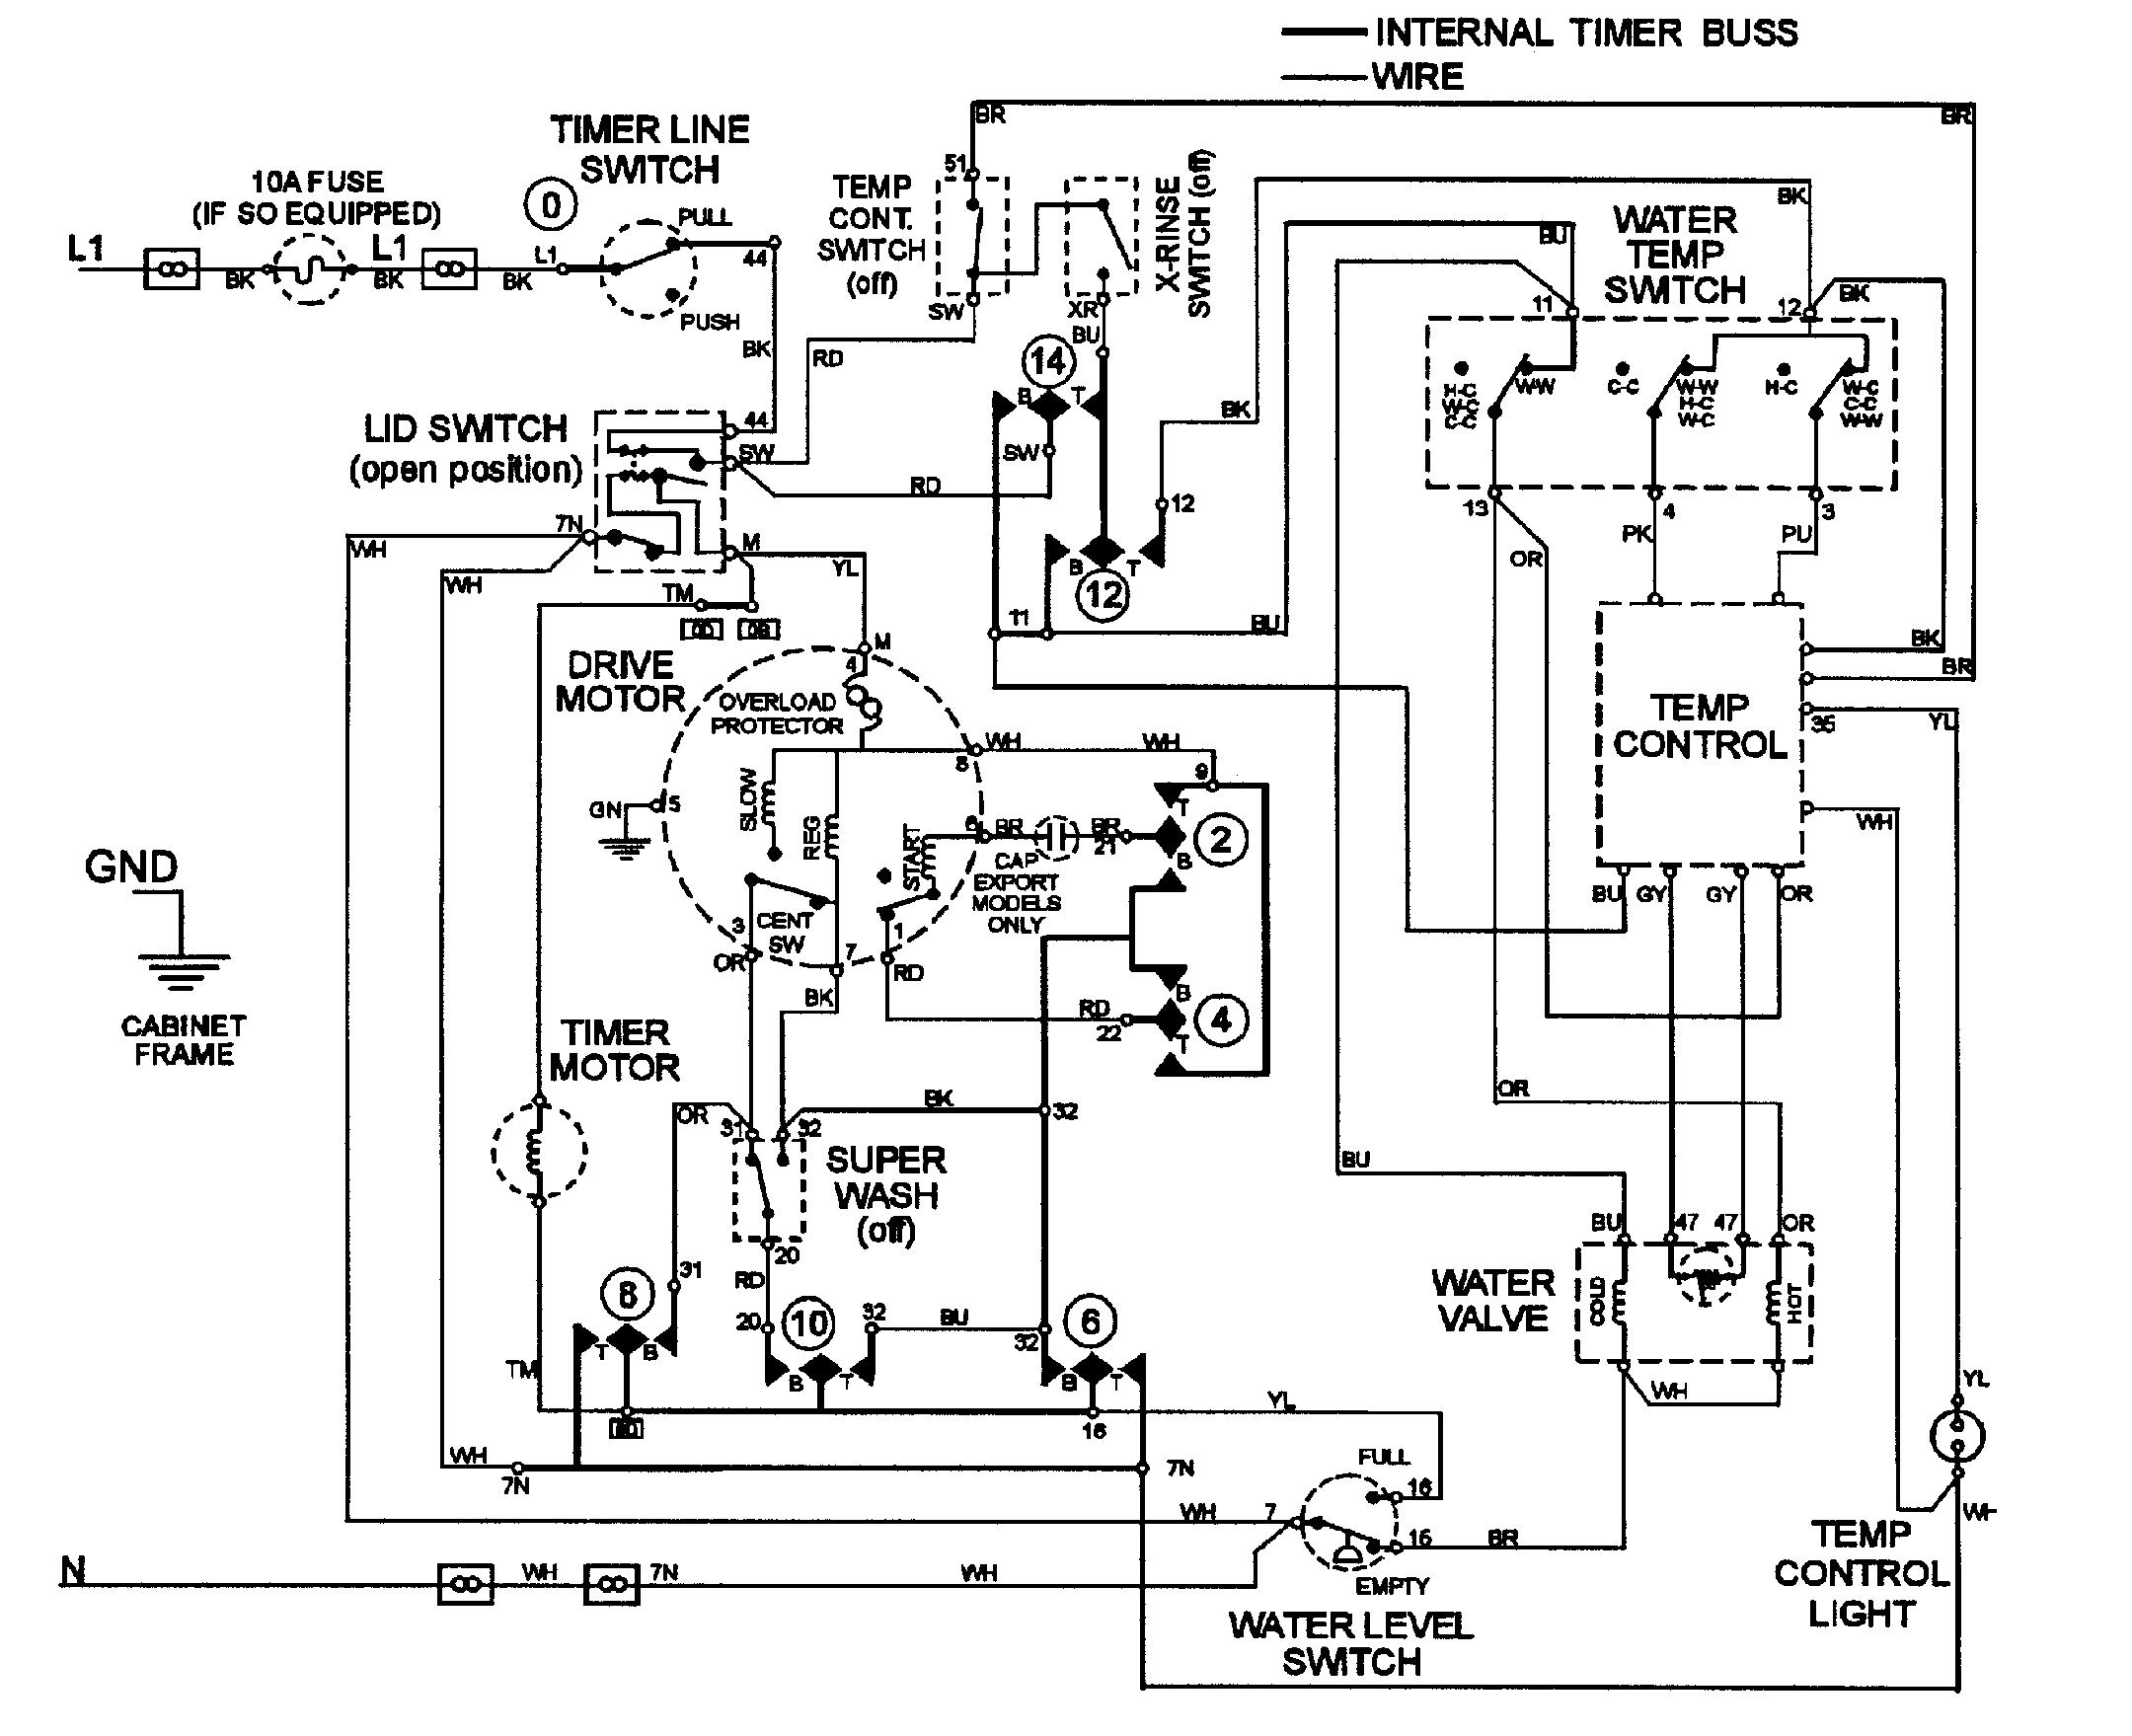 Wiring Diagram Besides Whirlpool Refrigerator Defrost Timer Likewise